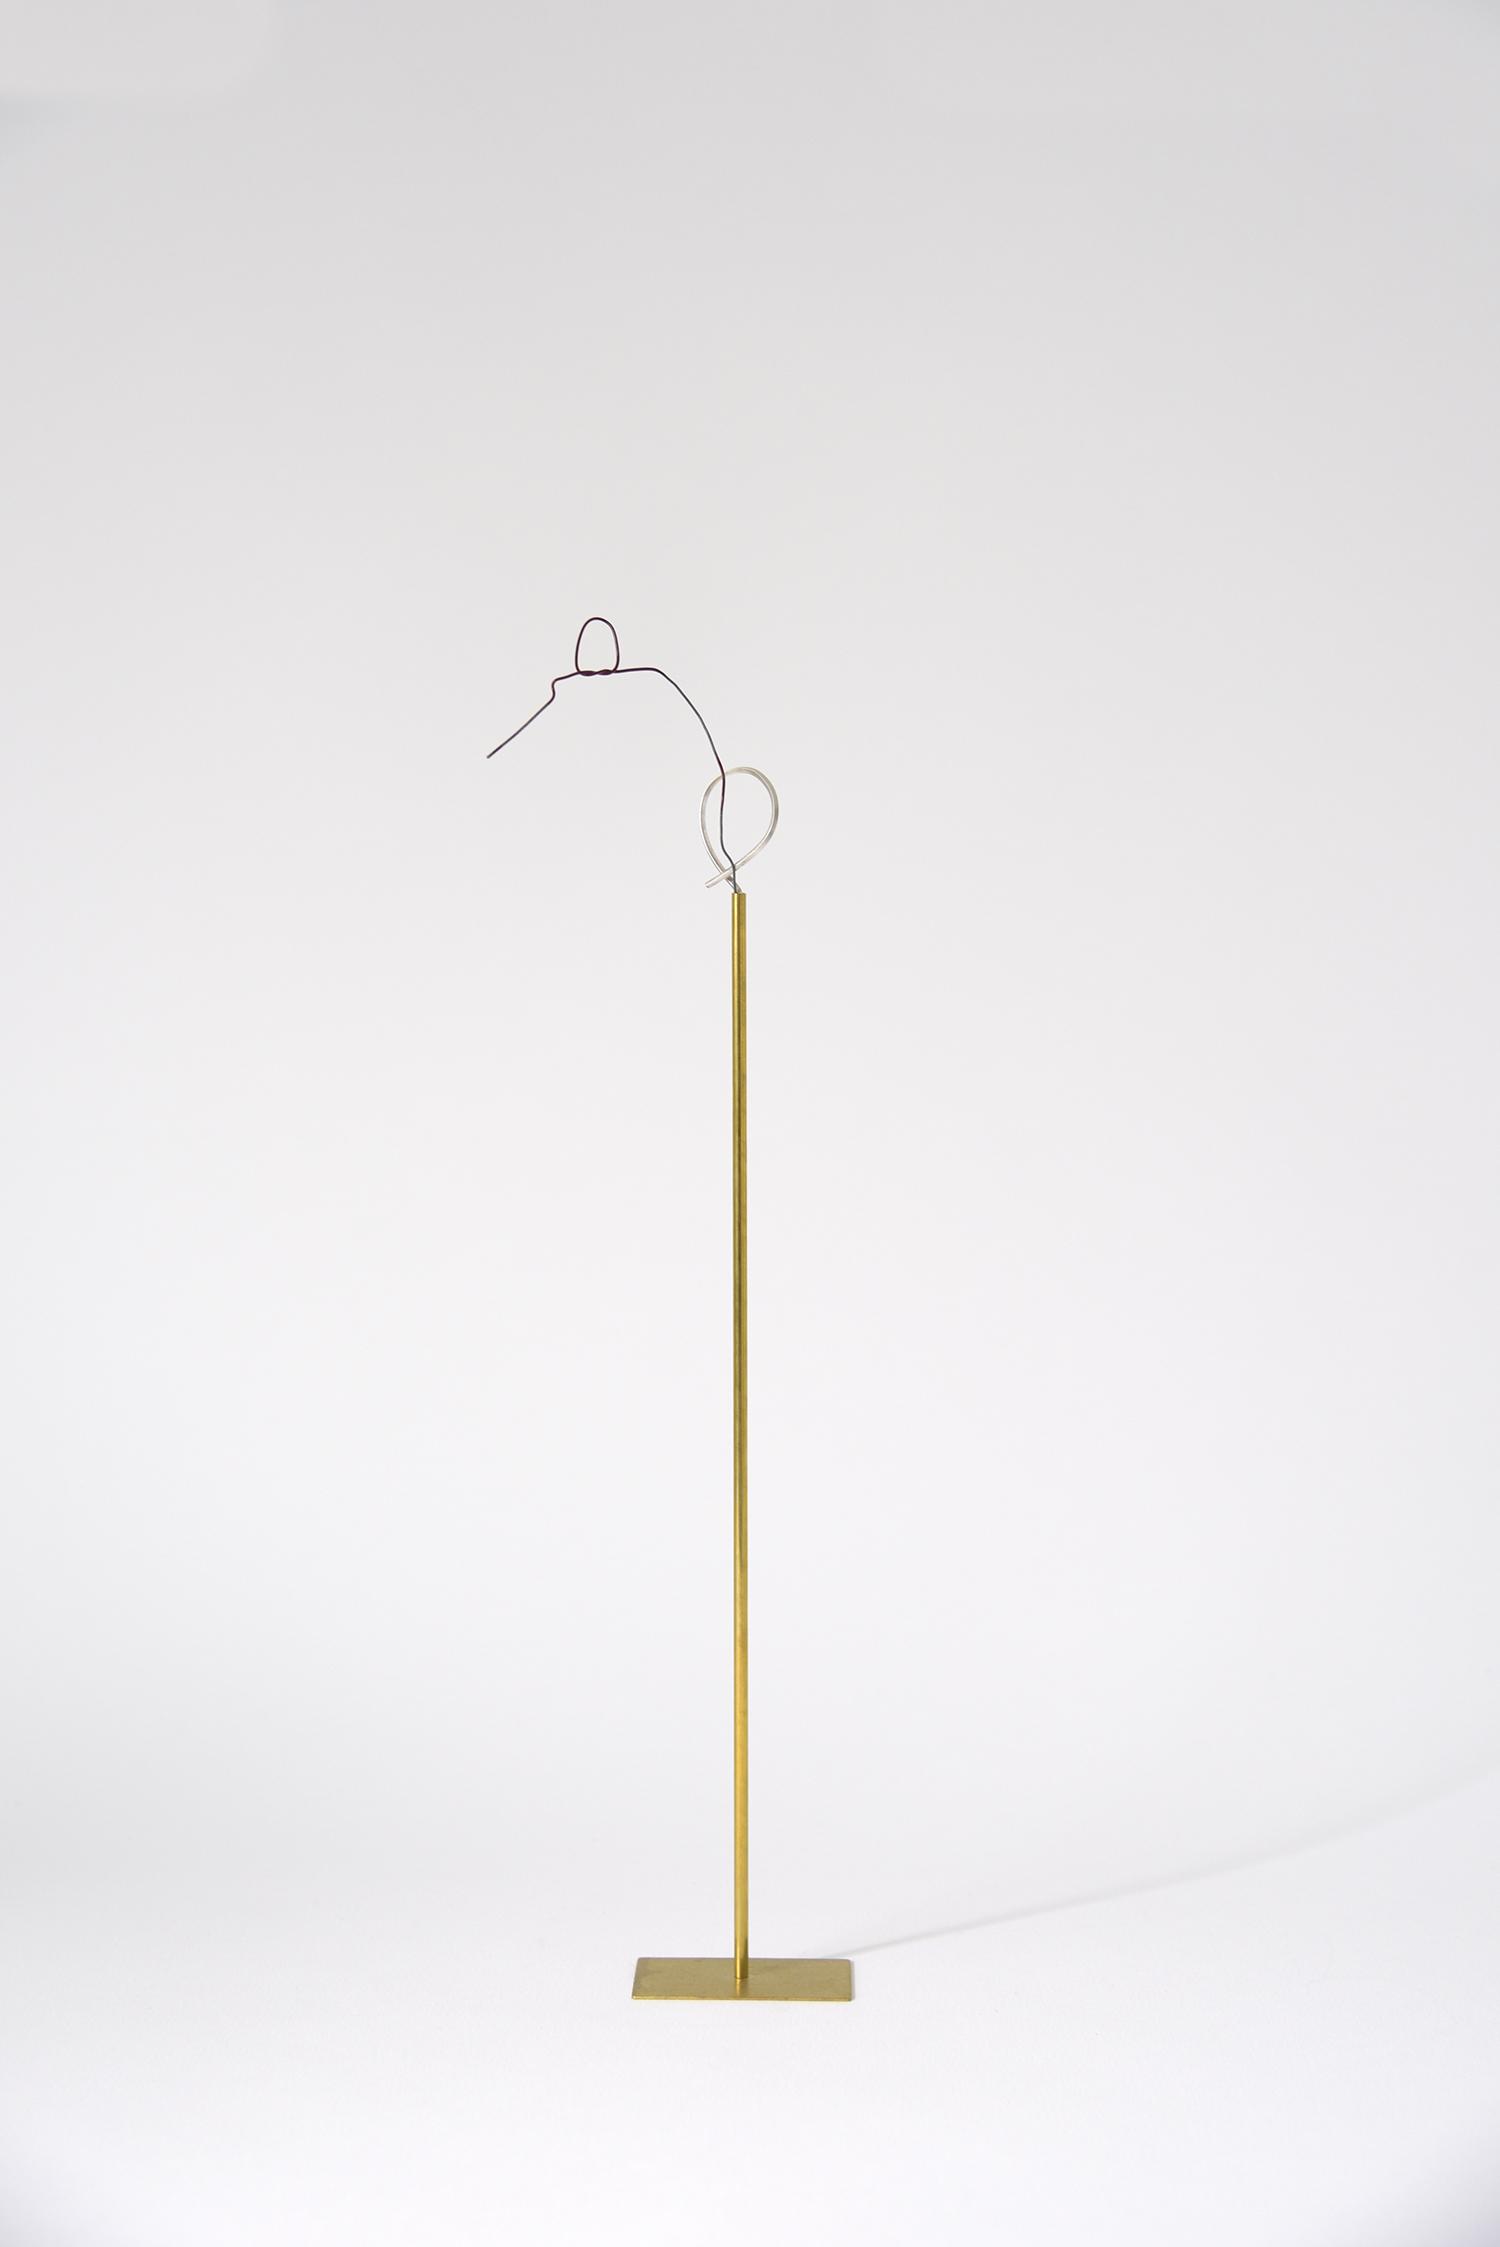 Hardbody Sculpture (Object) XX